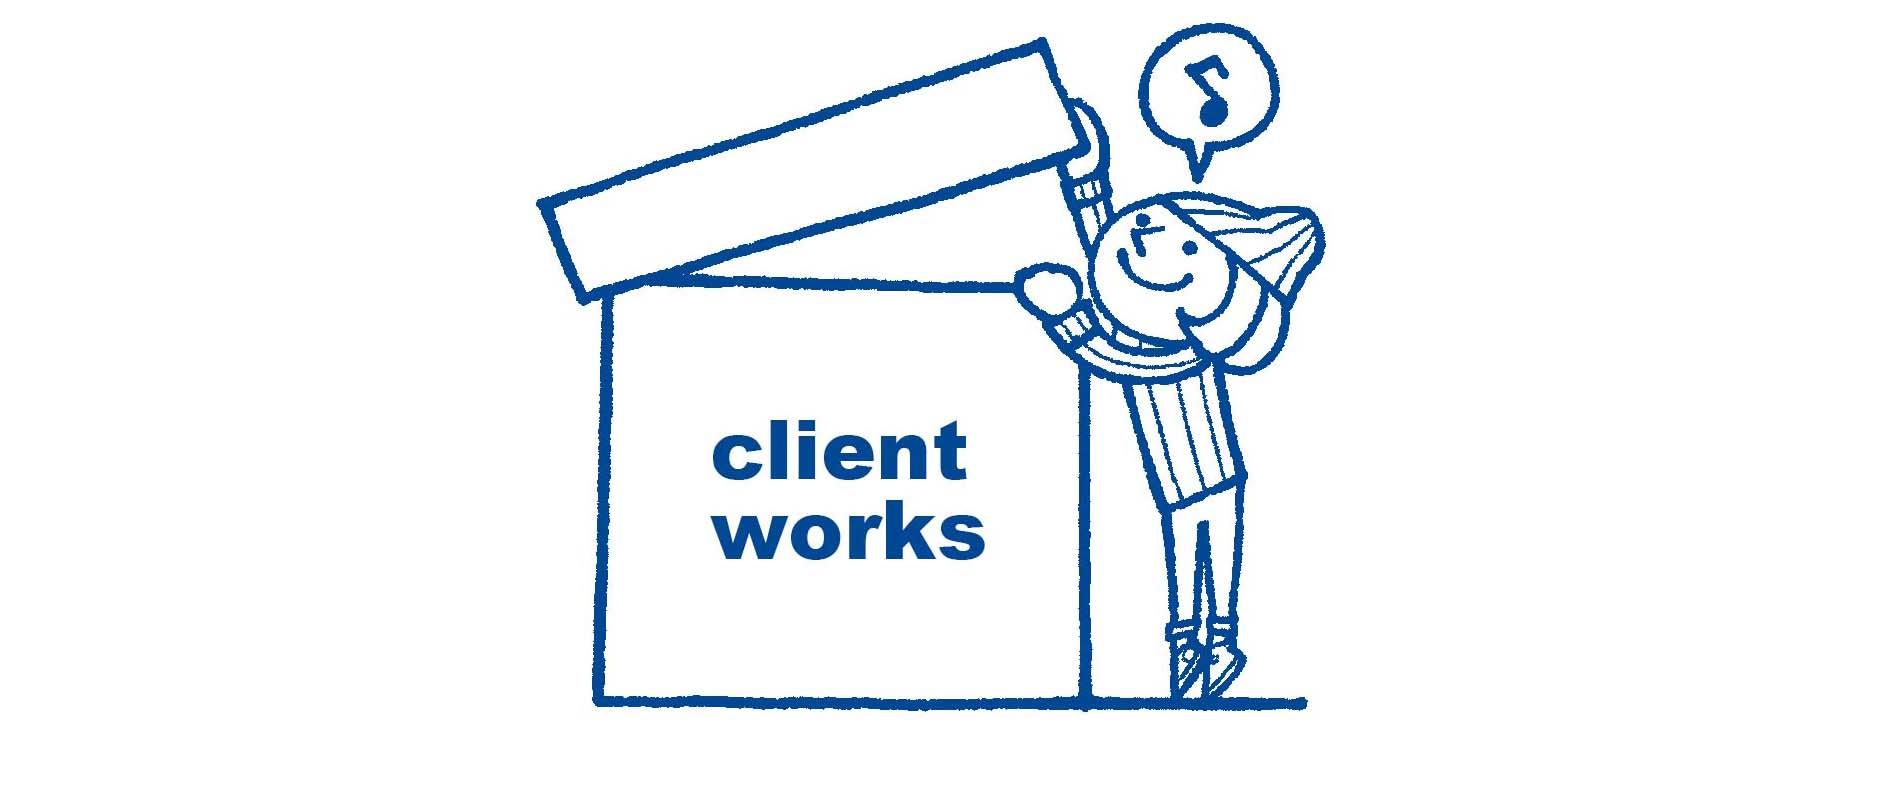 client works